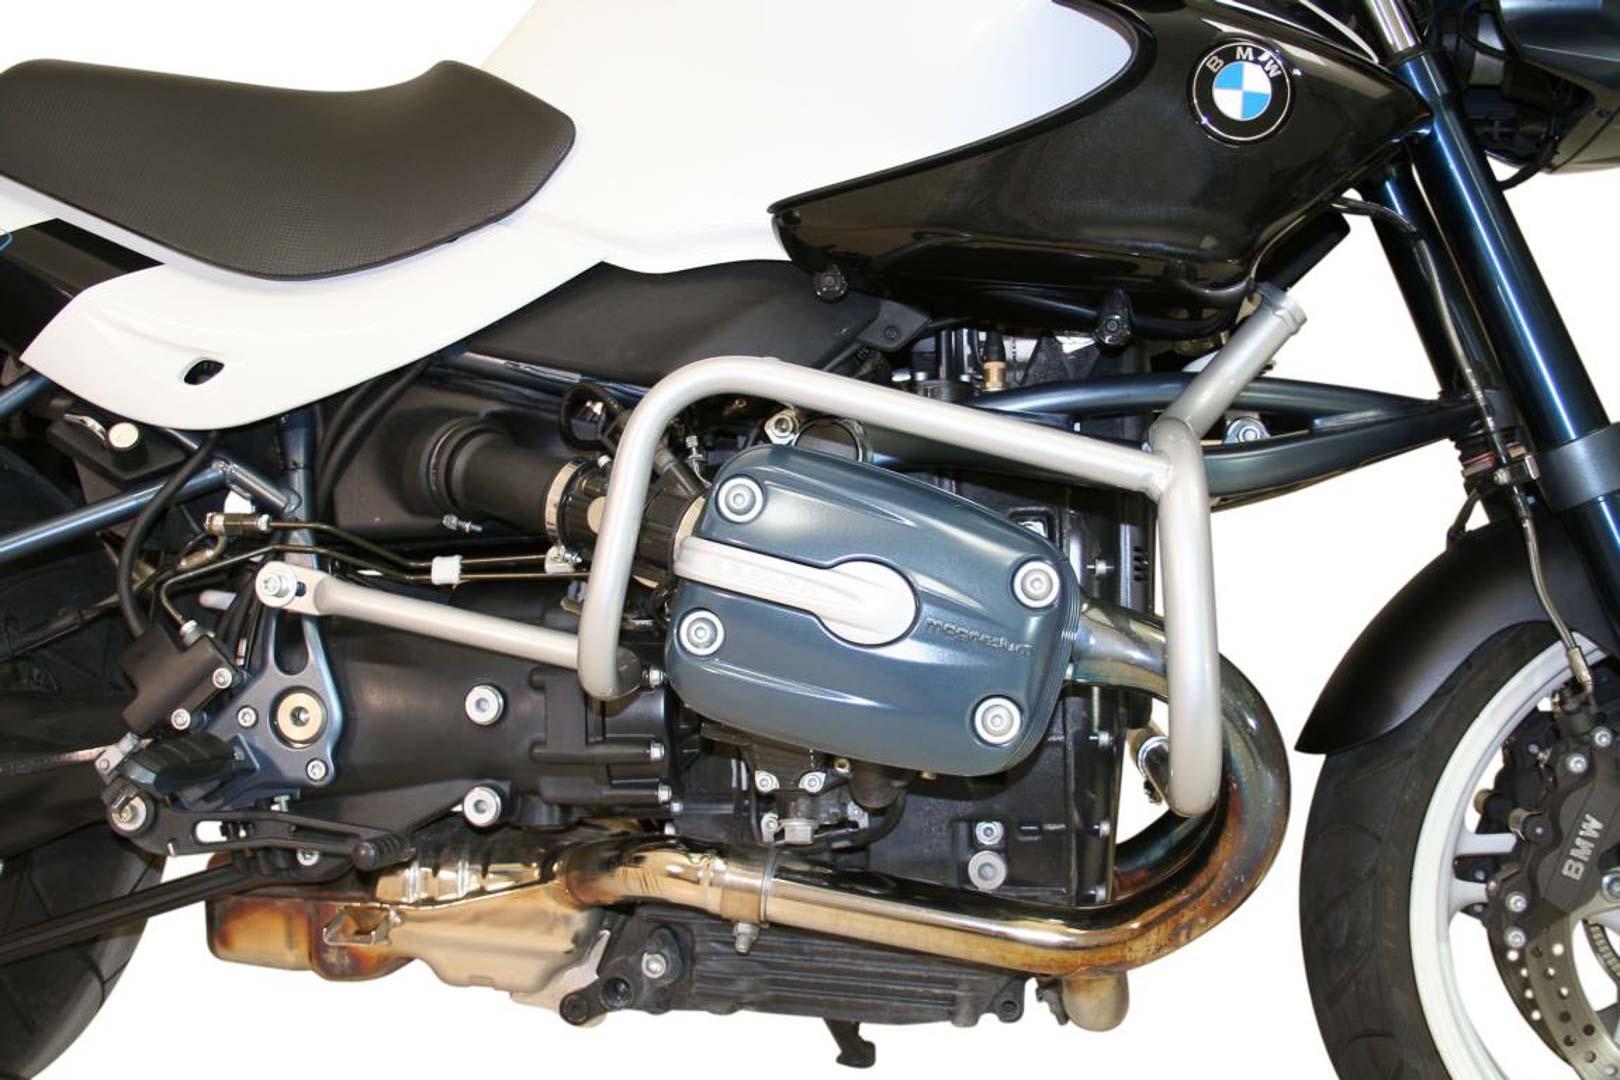 SW-Motech Moottorinsuojarauta BMW R1150R hopea